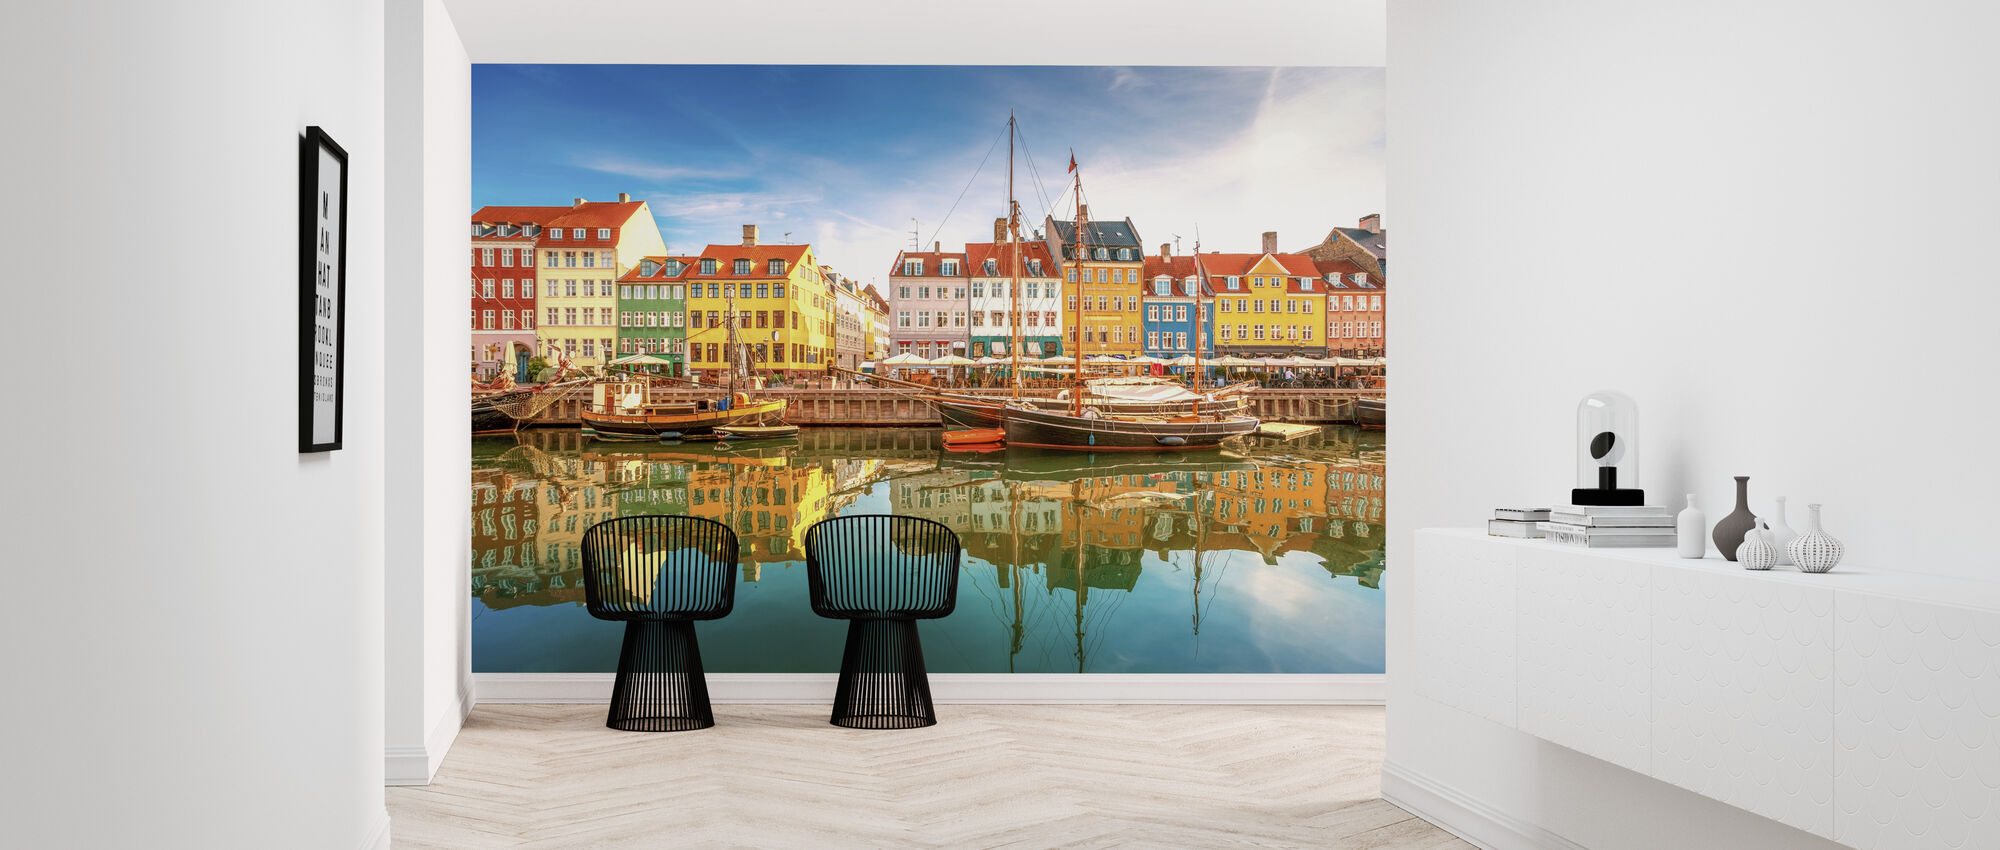 Nyhavn Canal - Wallpaper - Hallway